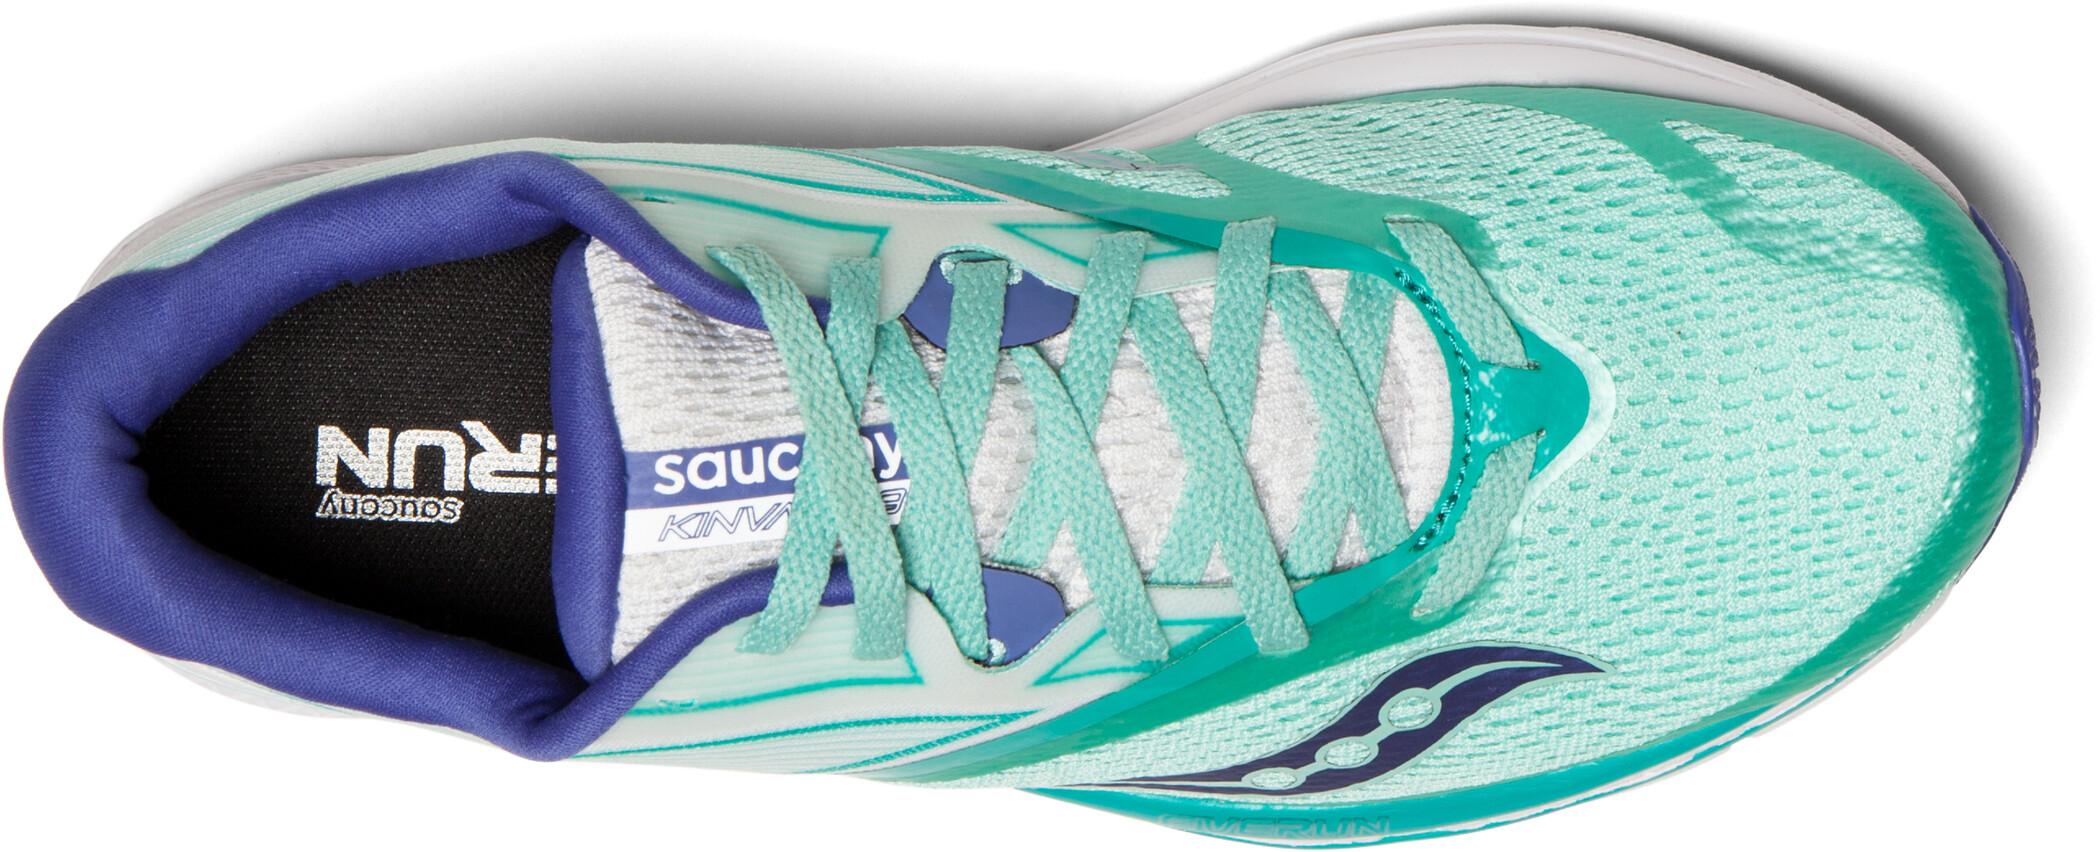 saucony Kinvara 9 Schuhe Damen aquawhite